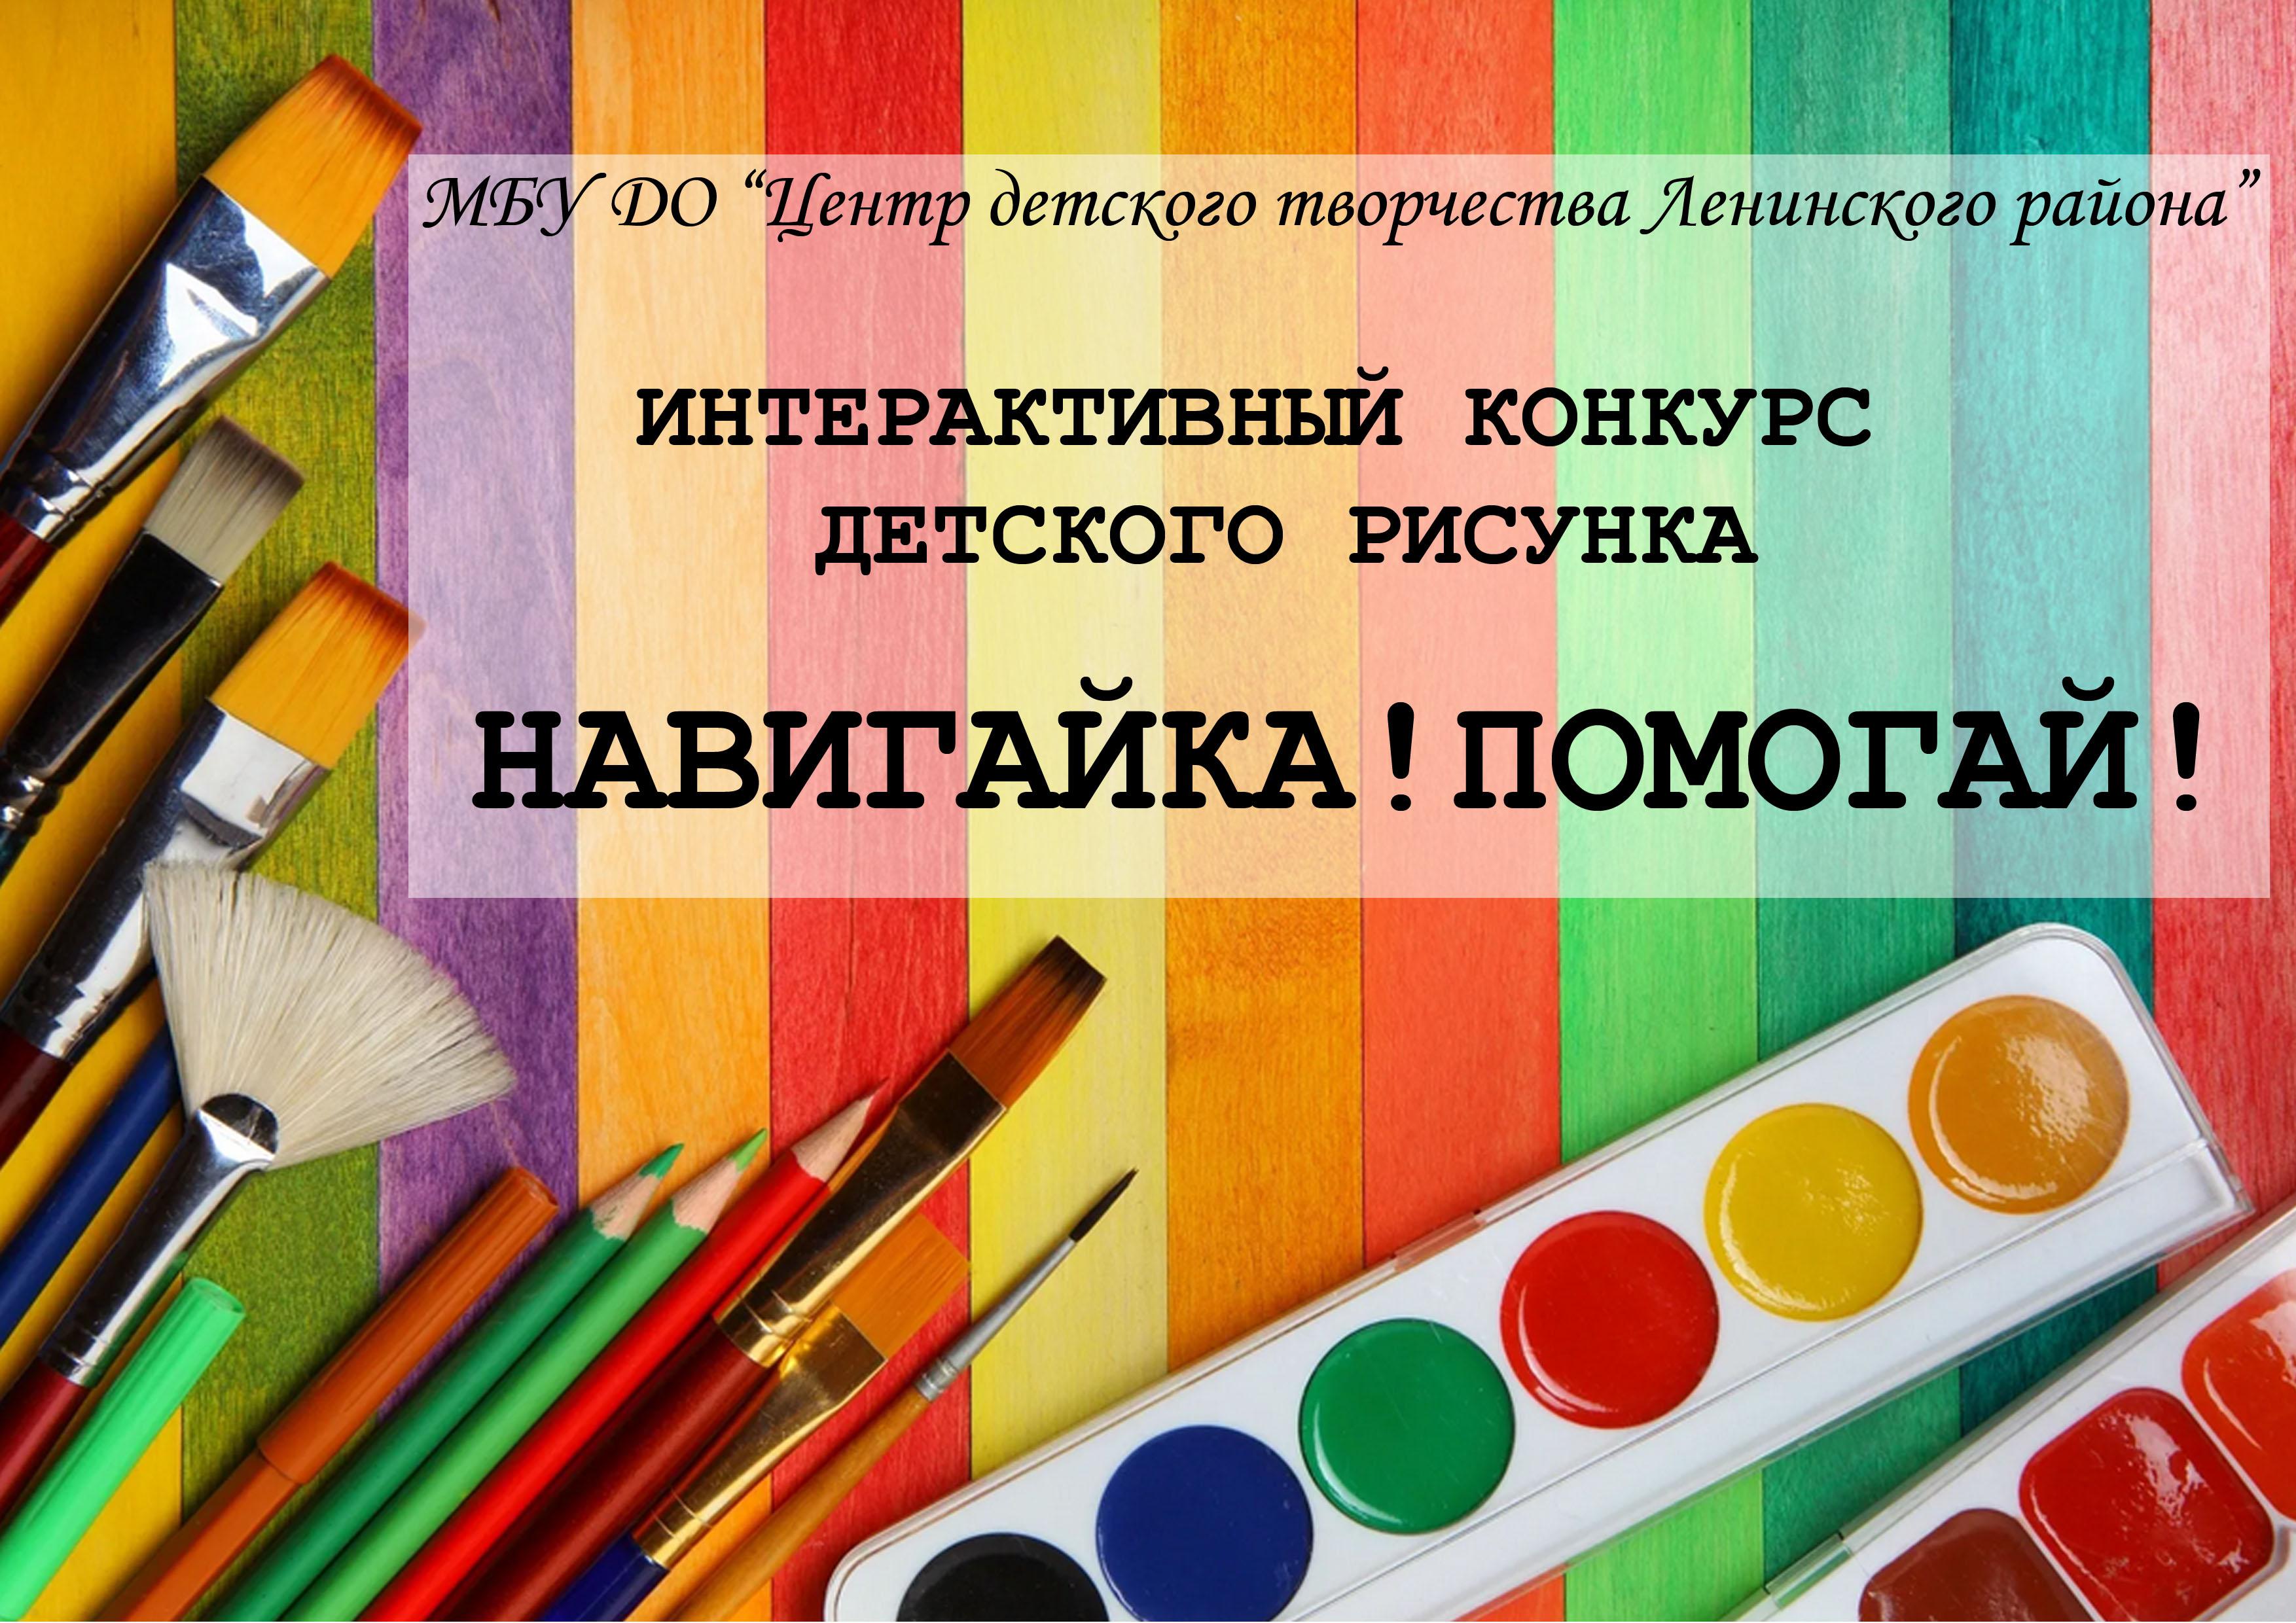 http://cdt-leninskii.ucoz.net/navigajka.jpg